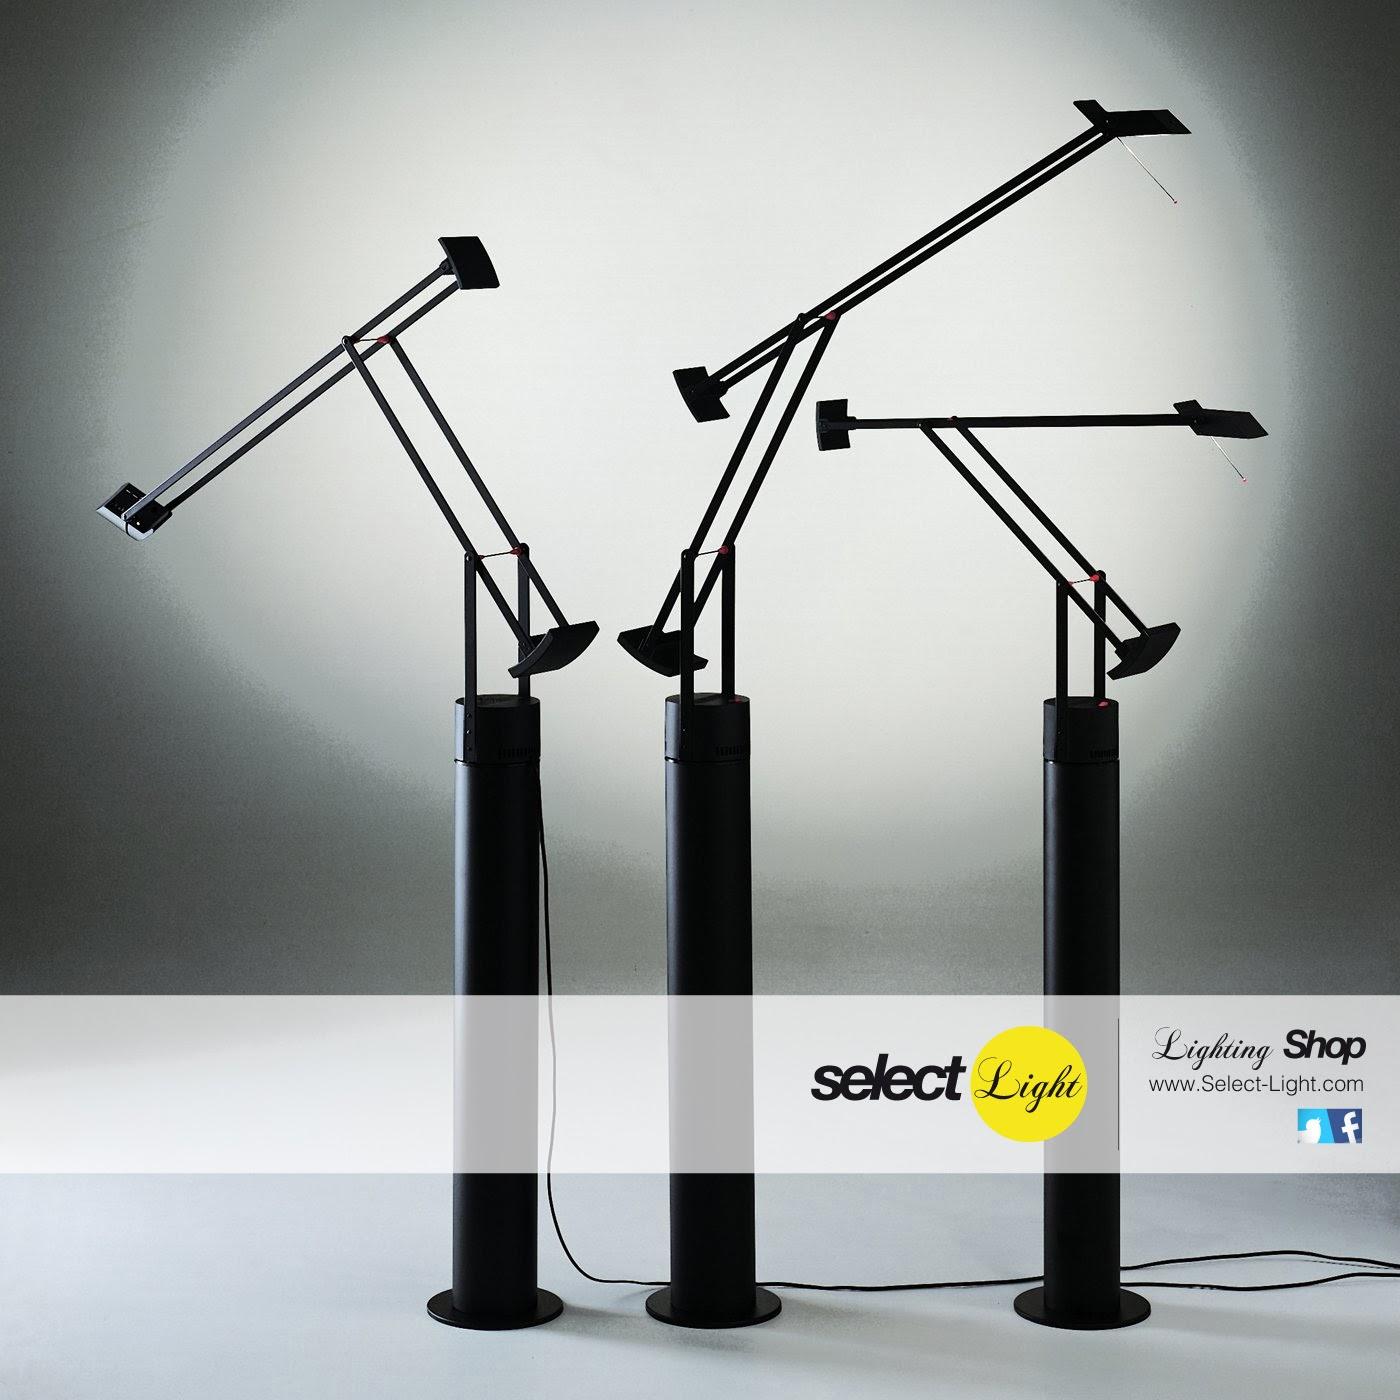 Tizio Artemide Lamp, design by Richard Sapper.